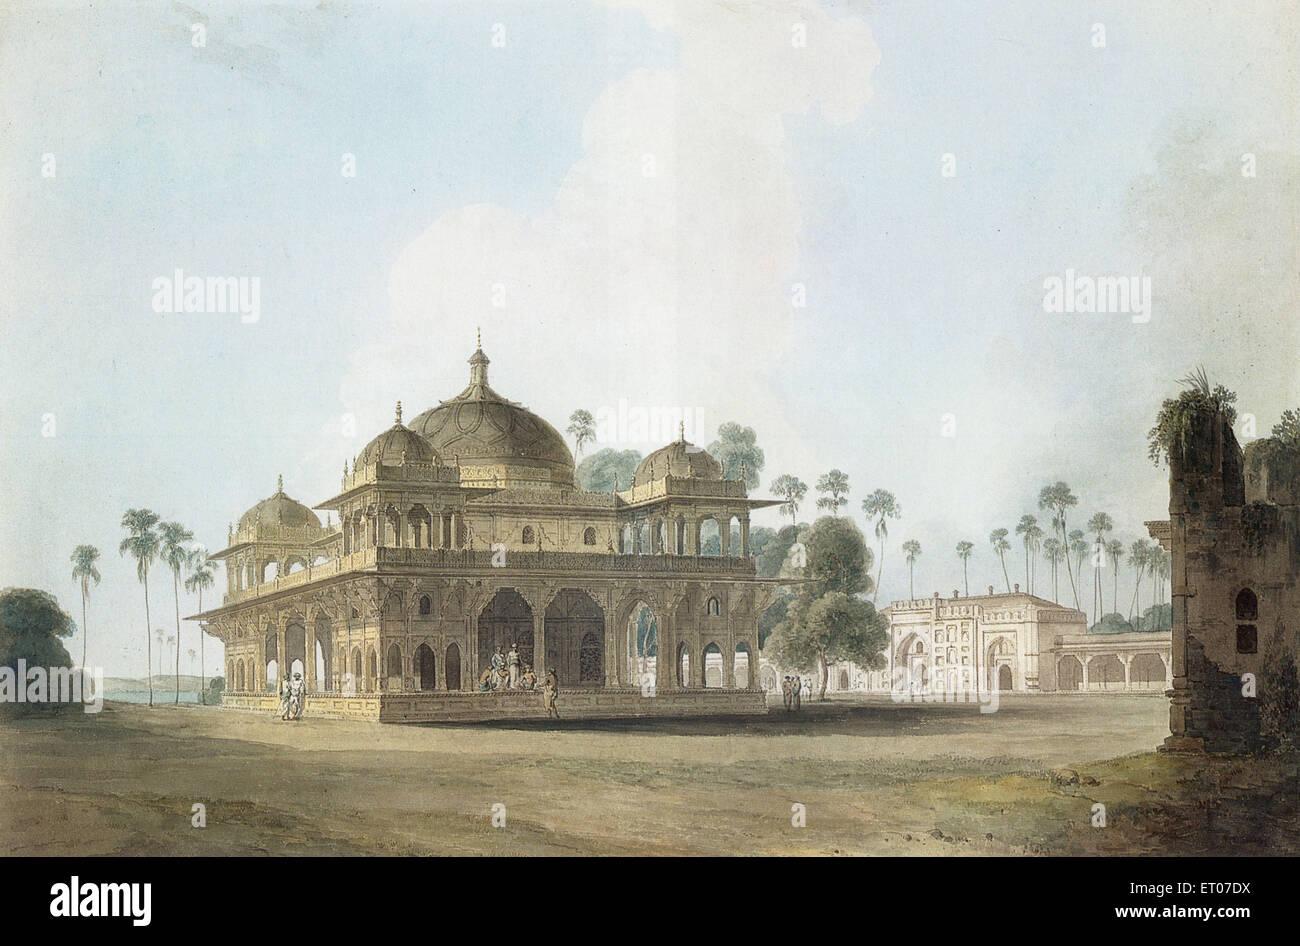 Mausoleum of Makhdum Shah Daulat ; Bihar ; India - Stock Image